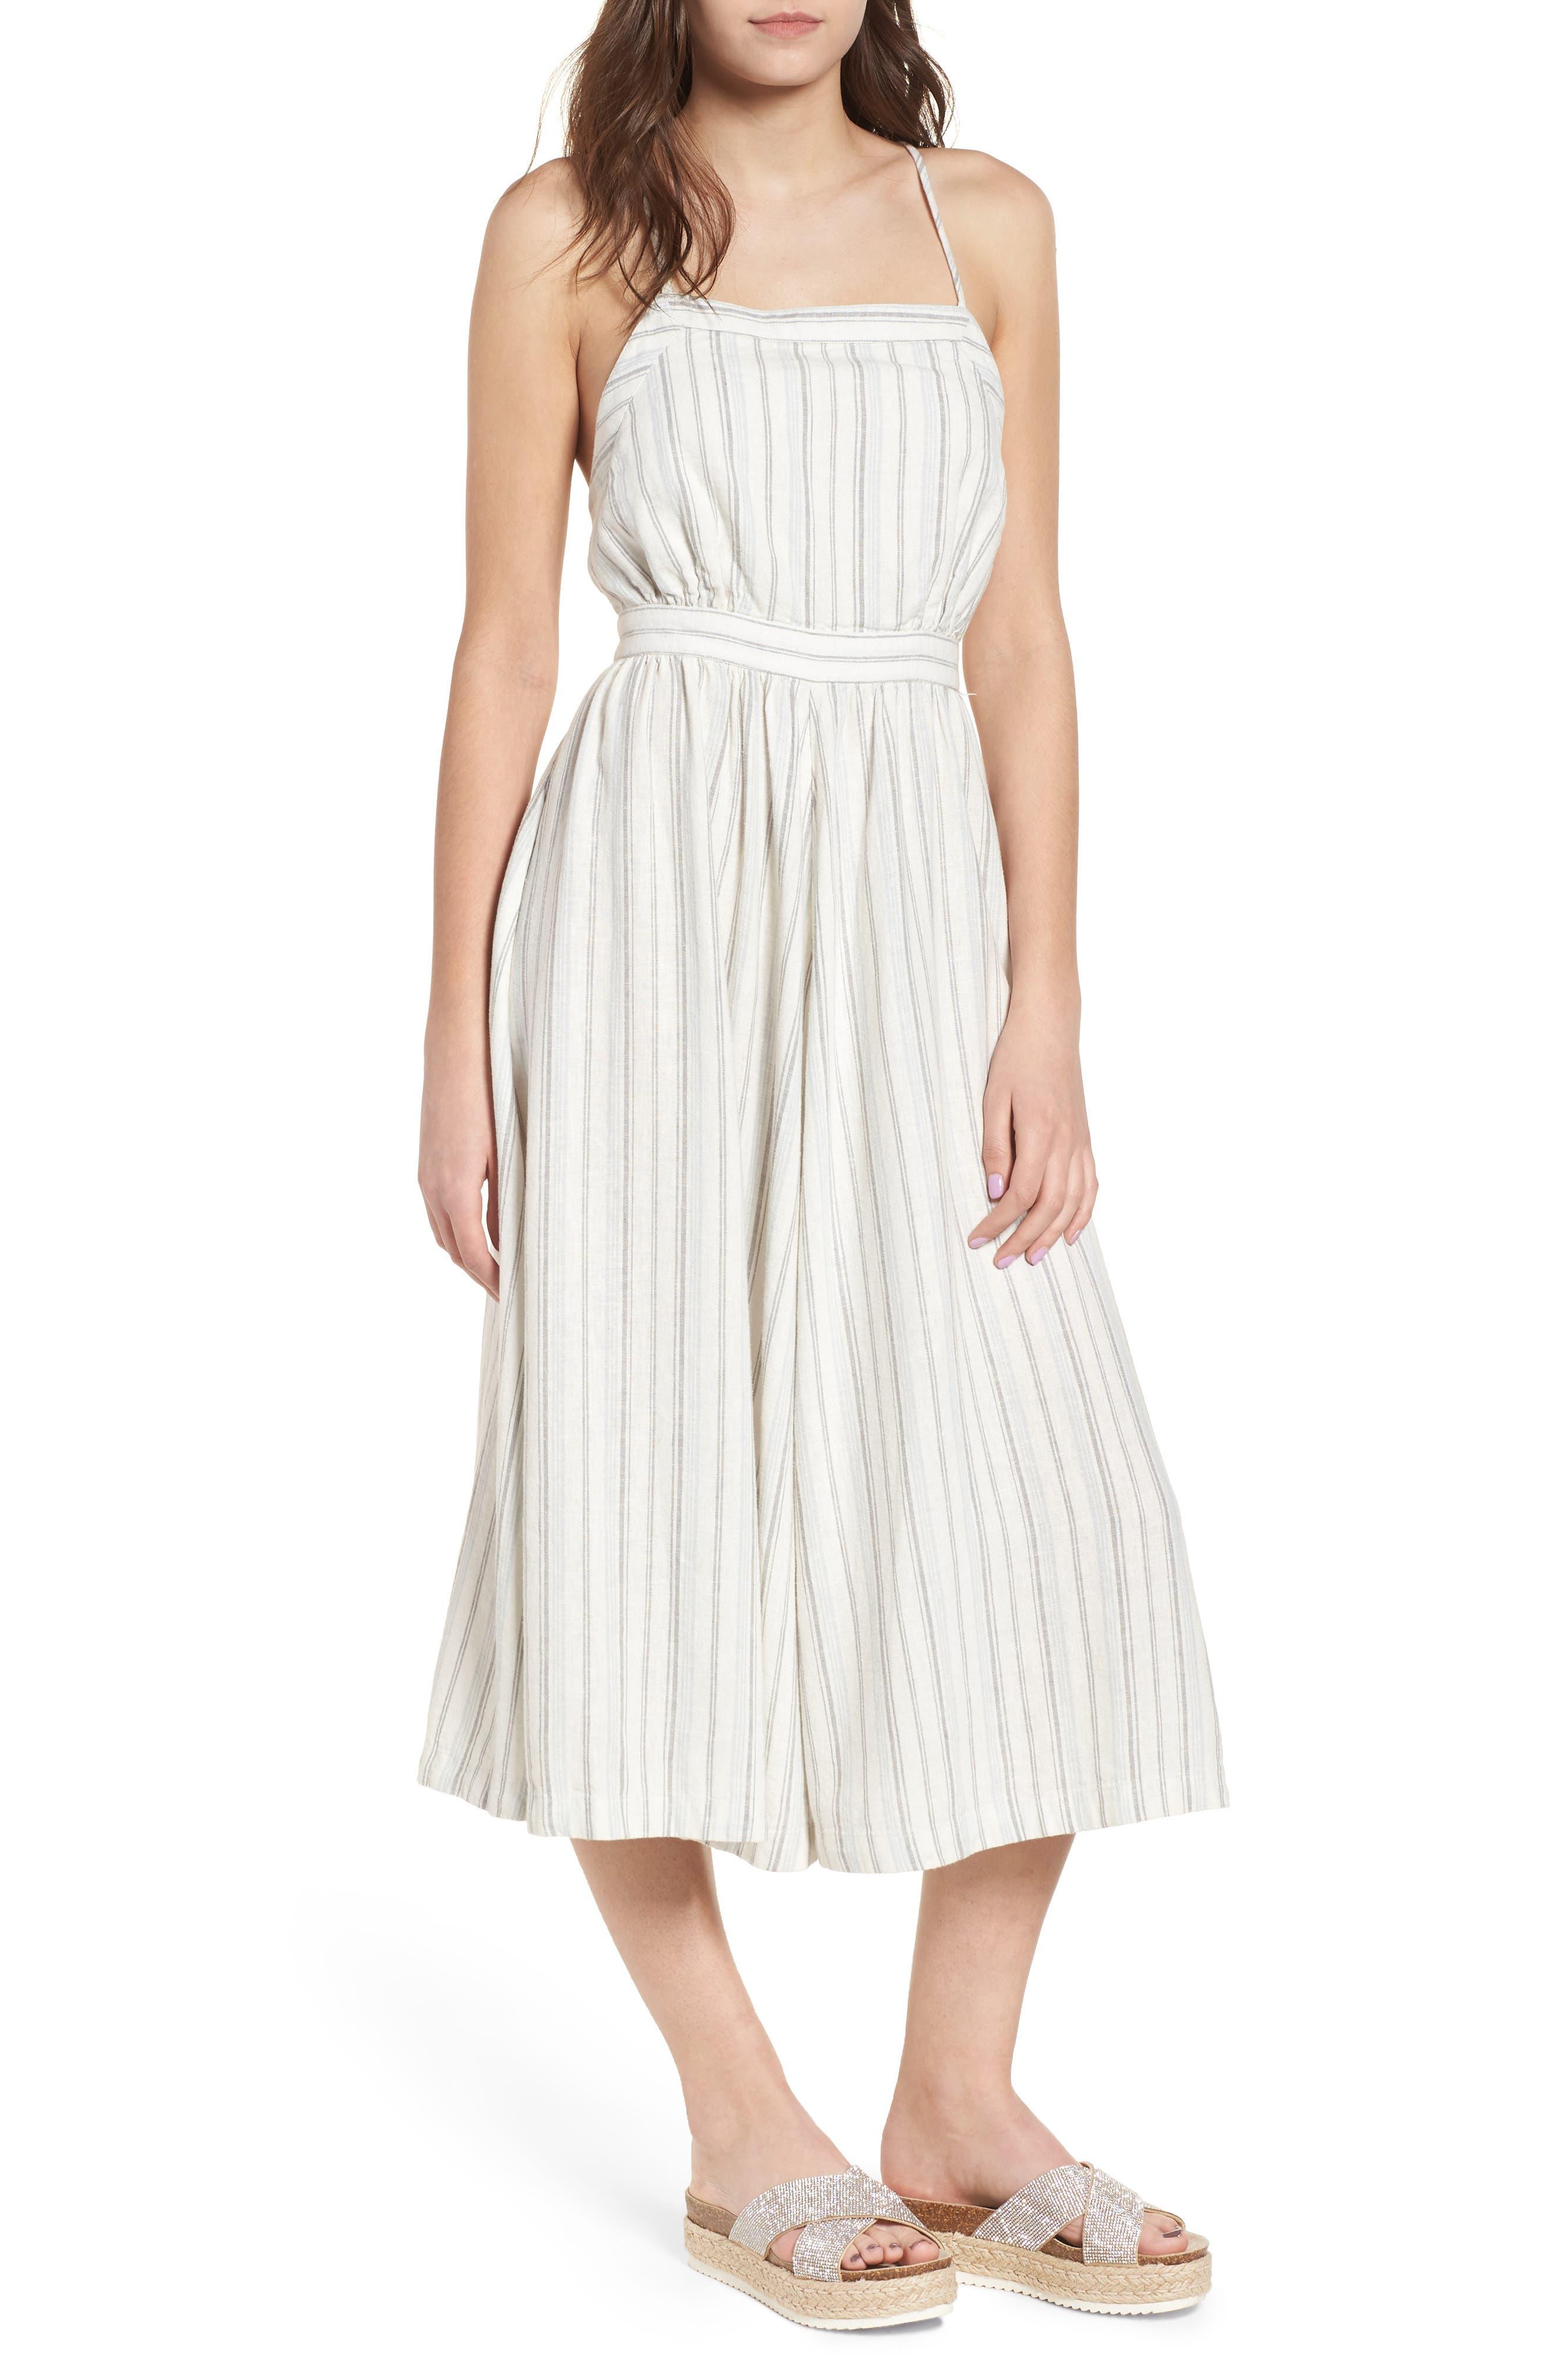 Stripe Apron Dress,                         Main,                         color, Ivory Verigated Stripe